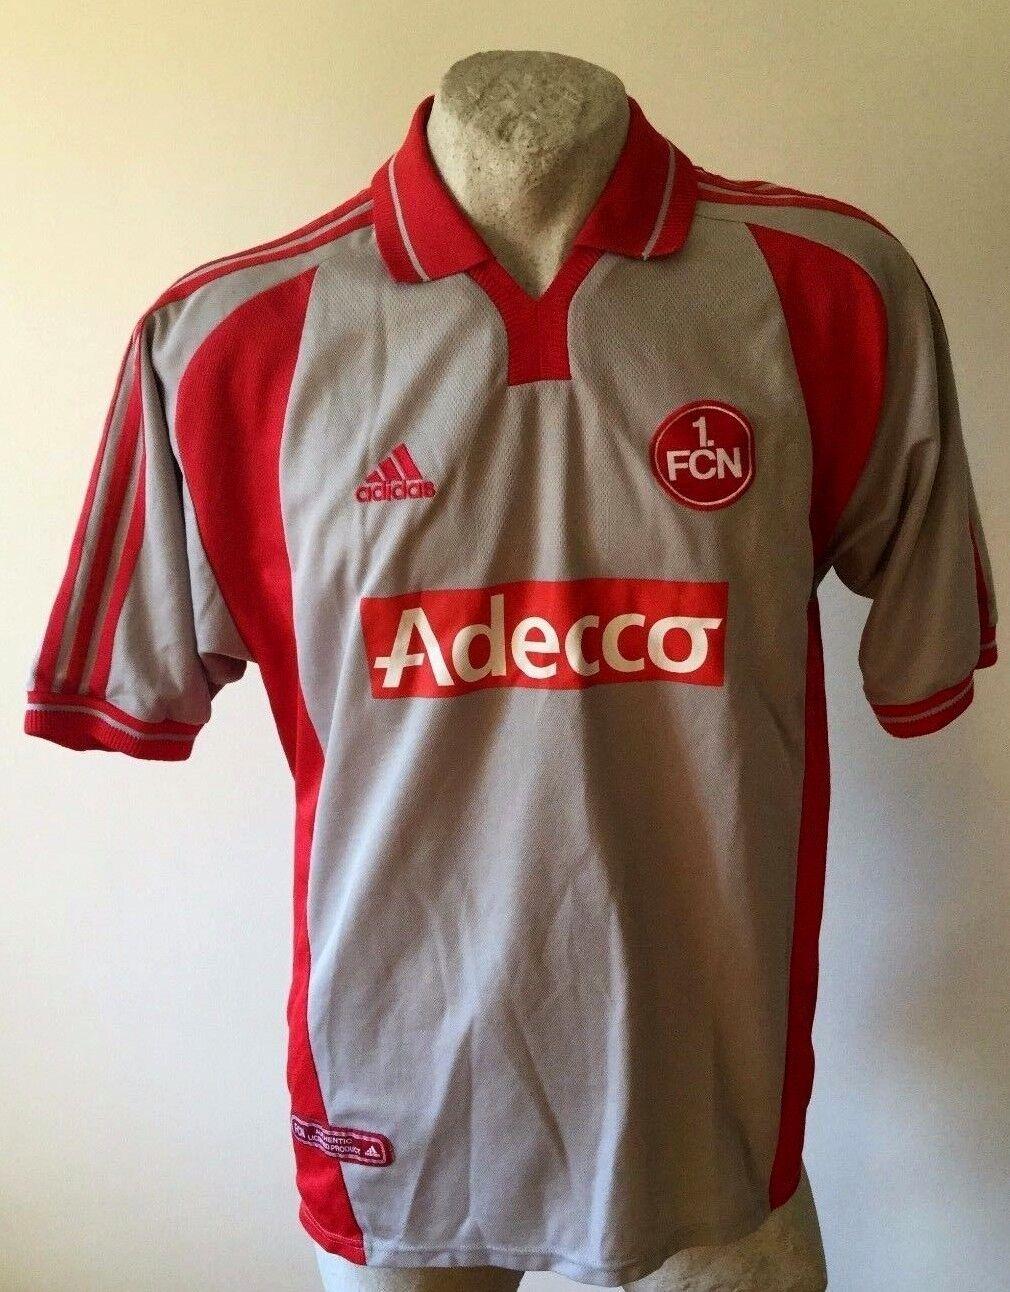 Maglia calcio fc nurnberg adidas adecco 2001 away football shirt trikot size